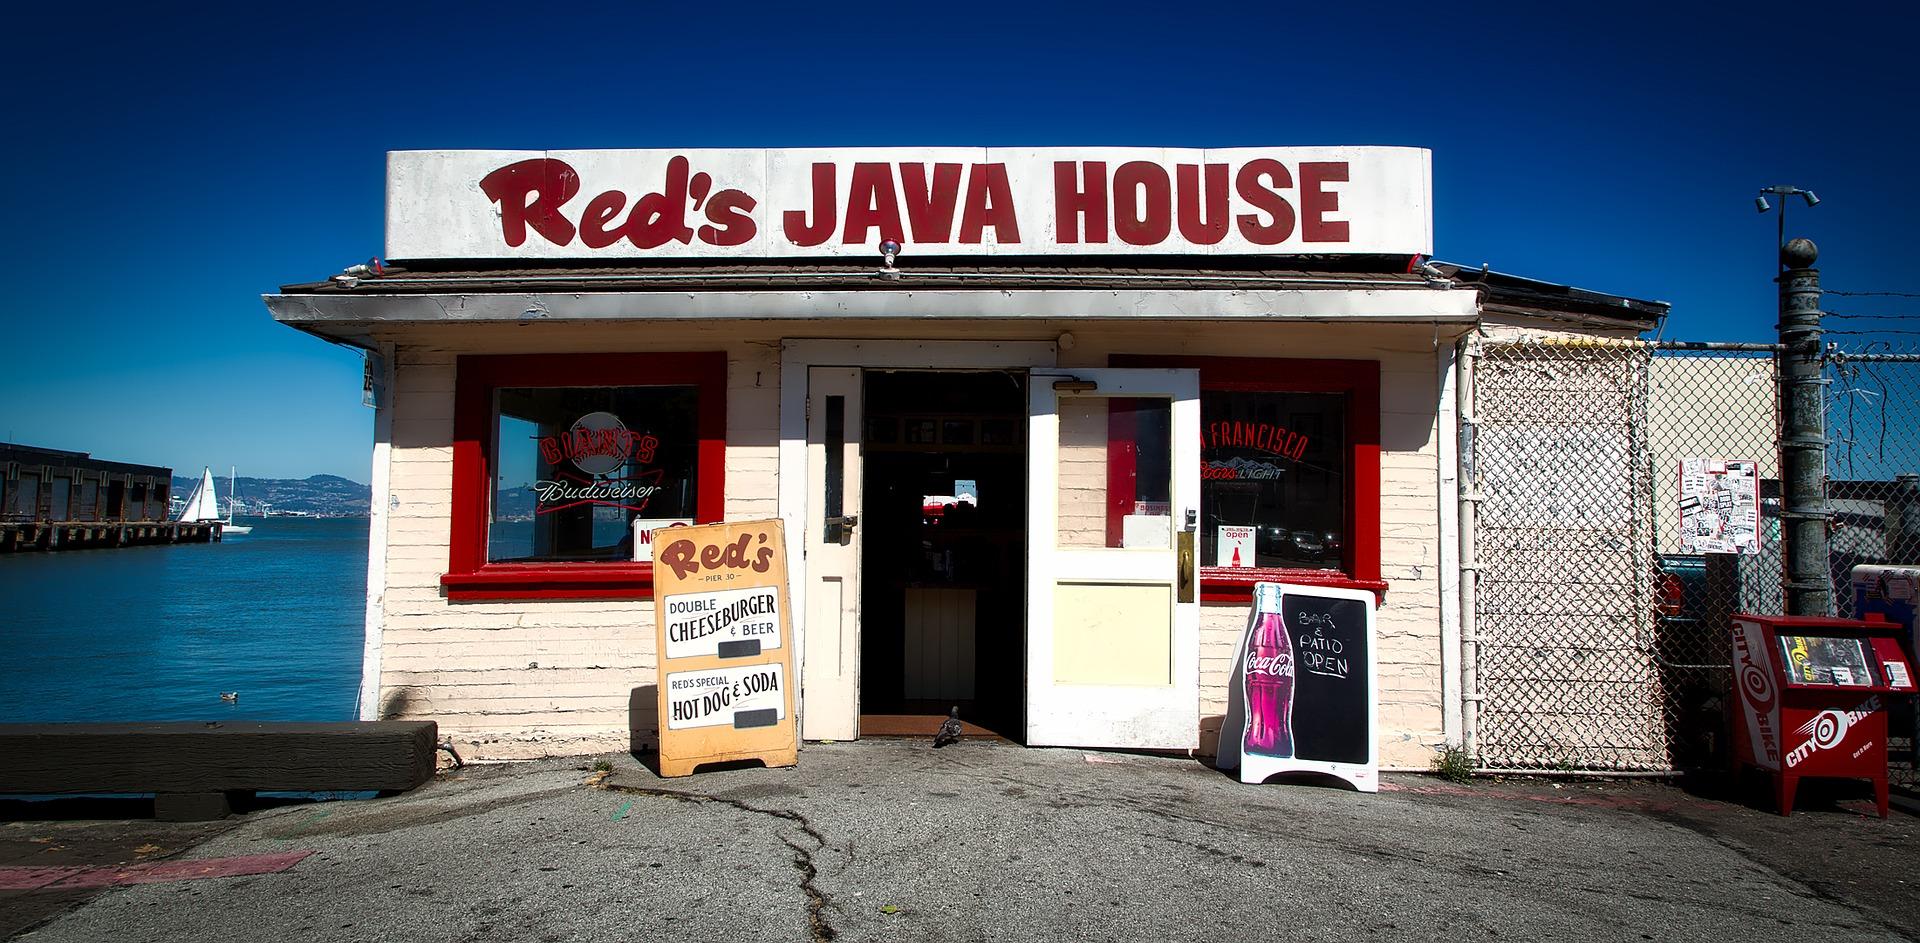 reds-java-house-1591357_1920